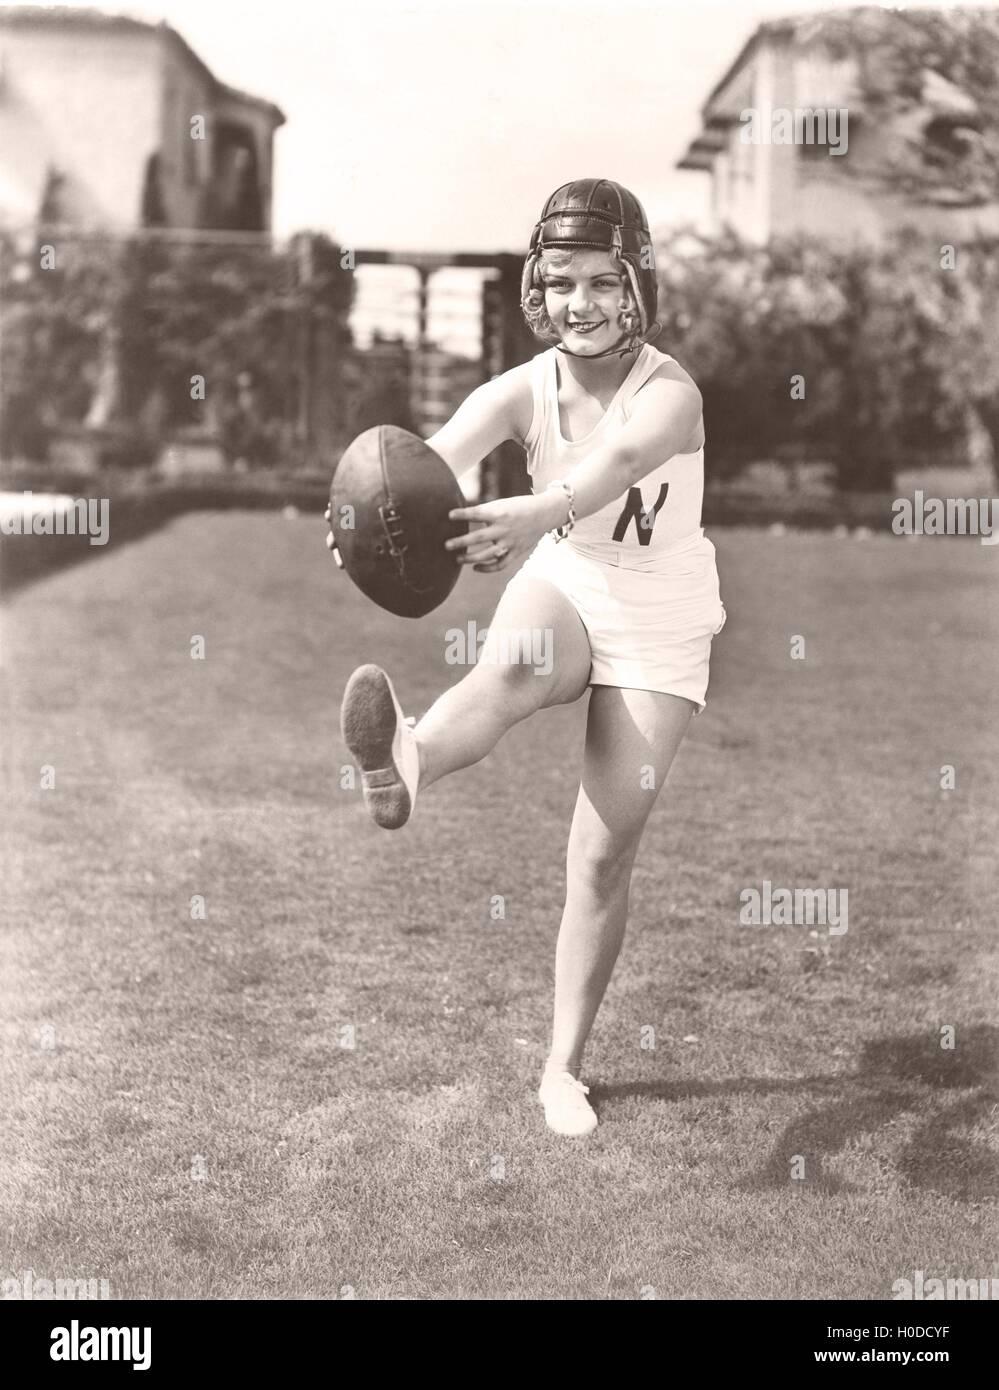 Woman playing football - Stock Image